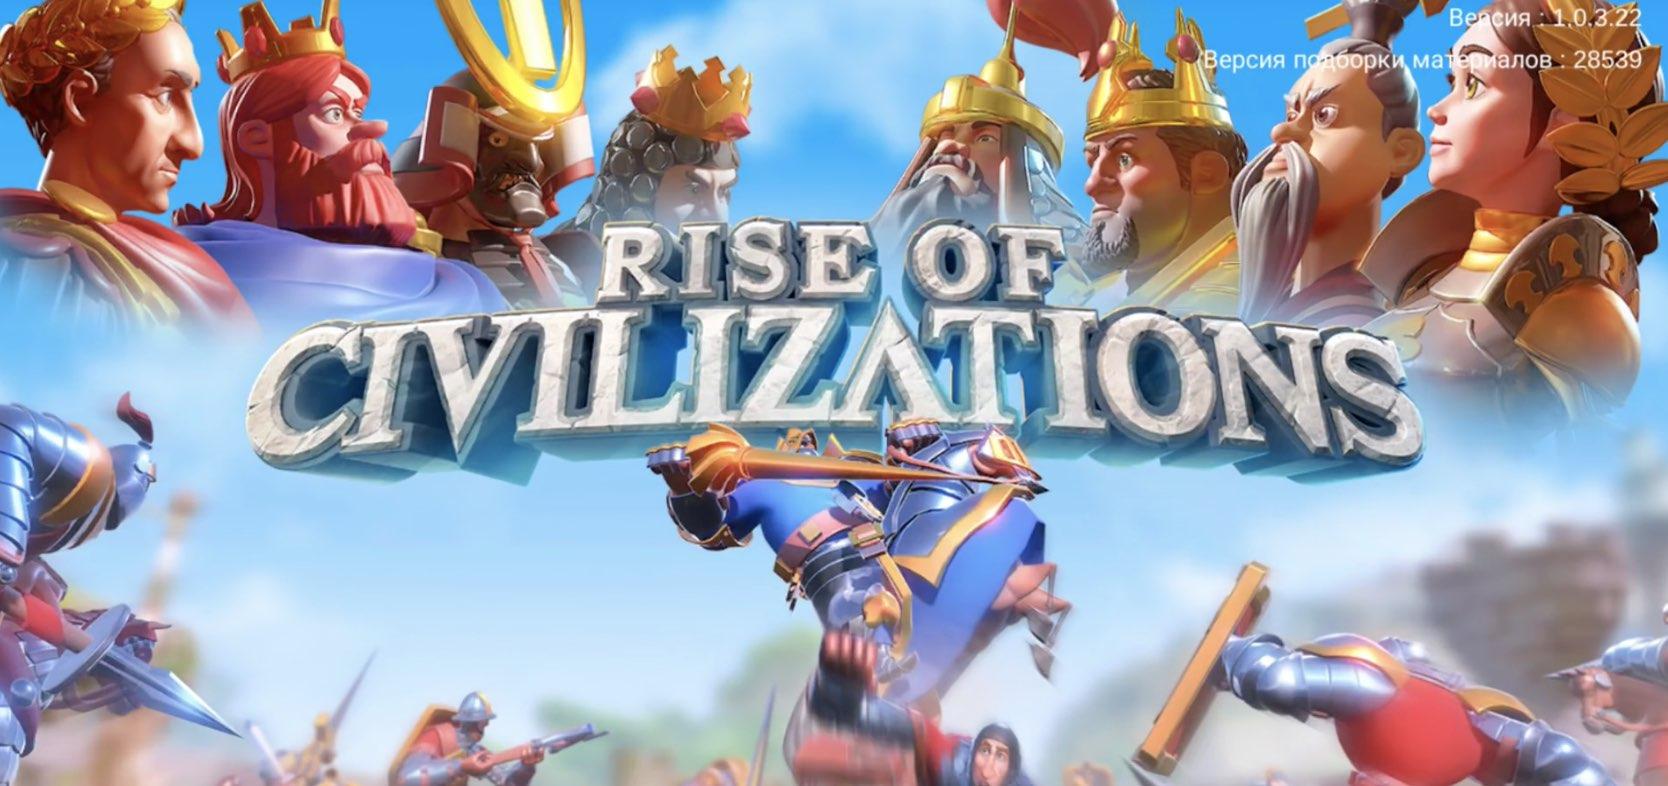 Rise of civilizations читы